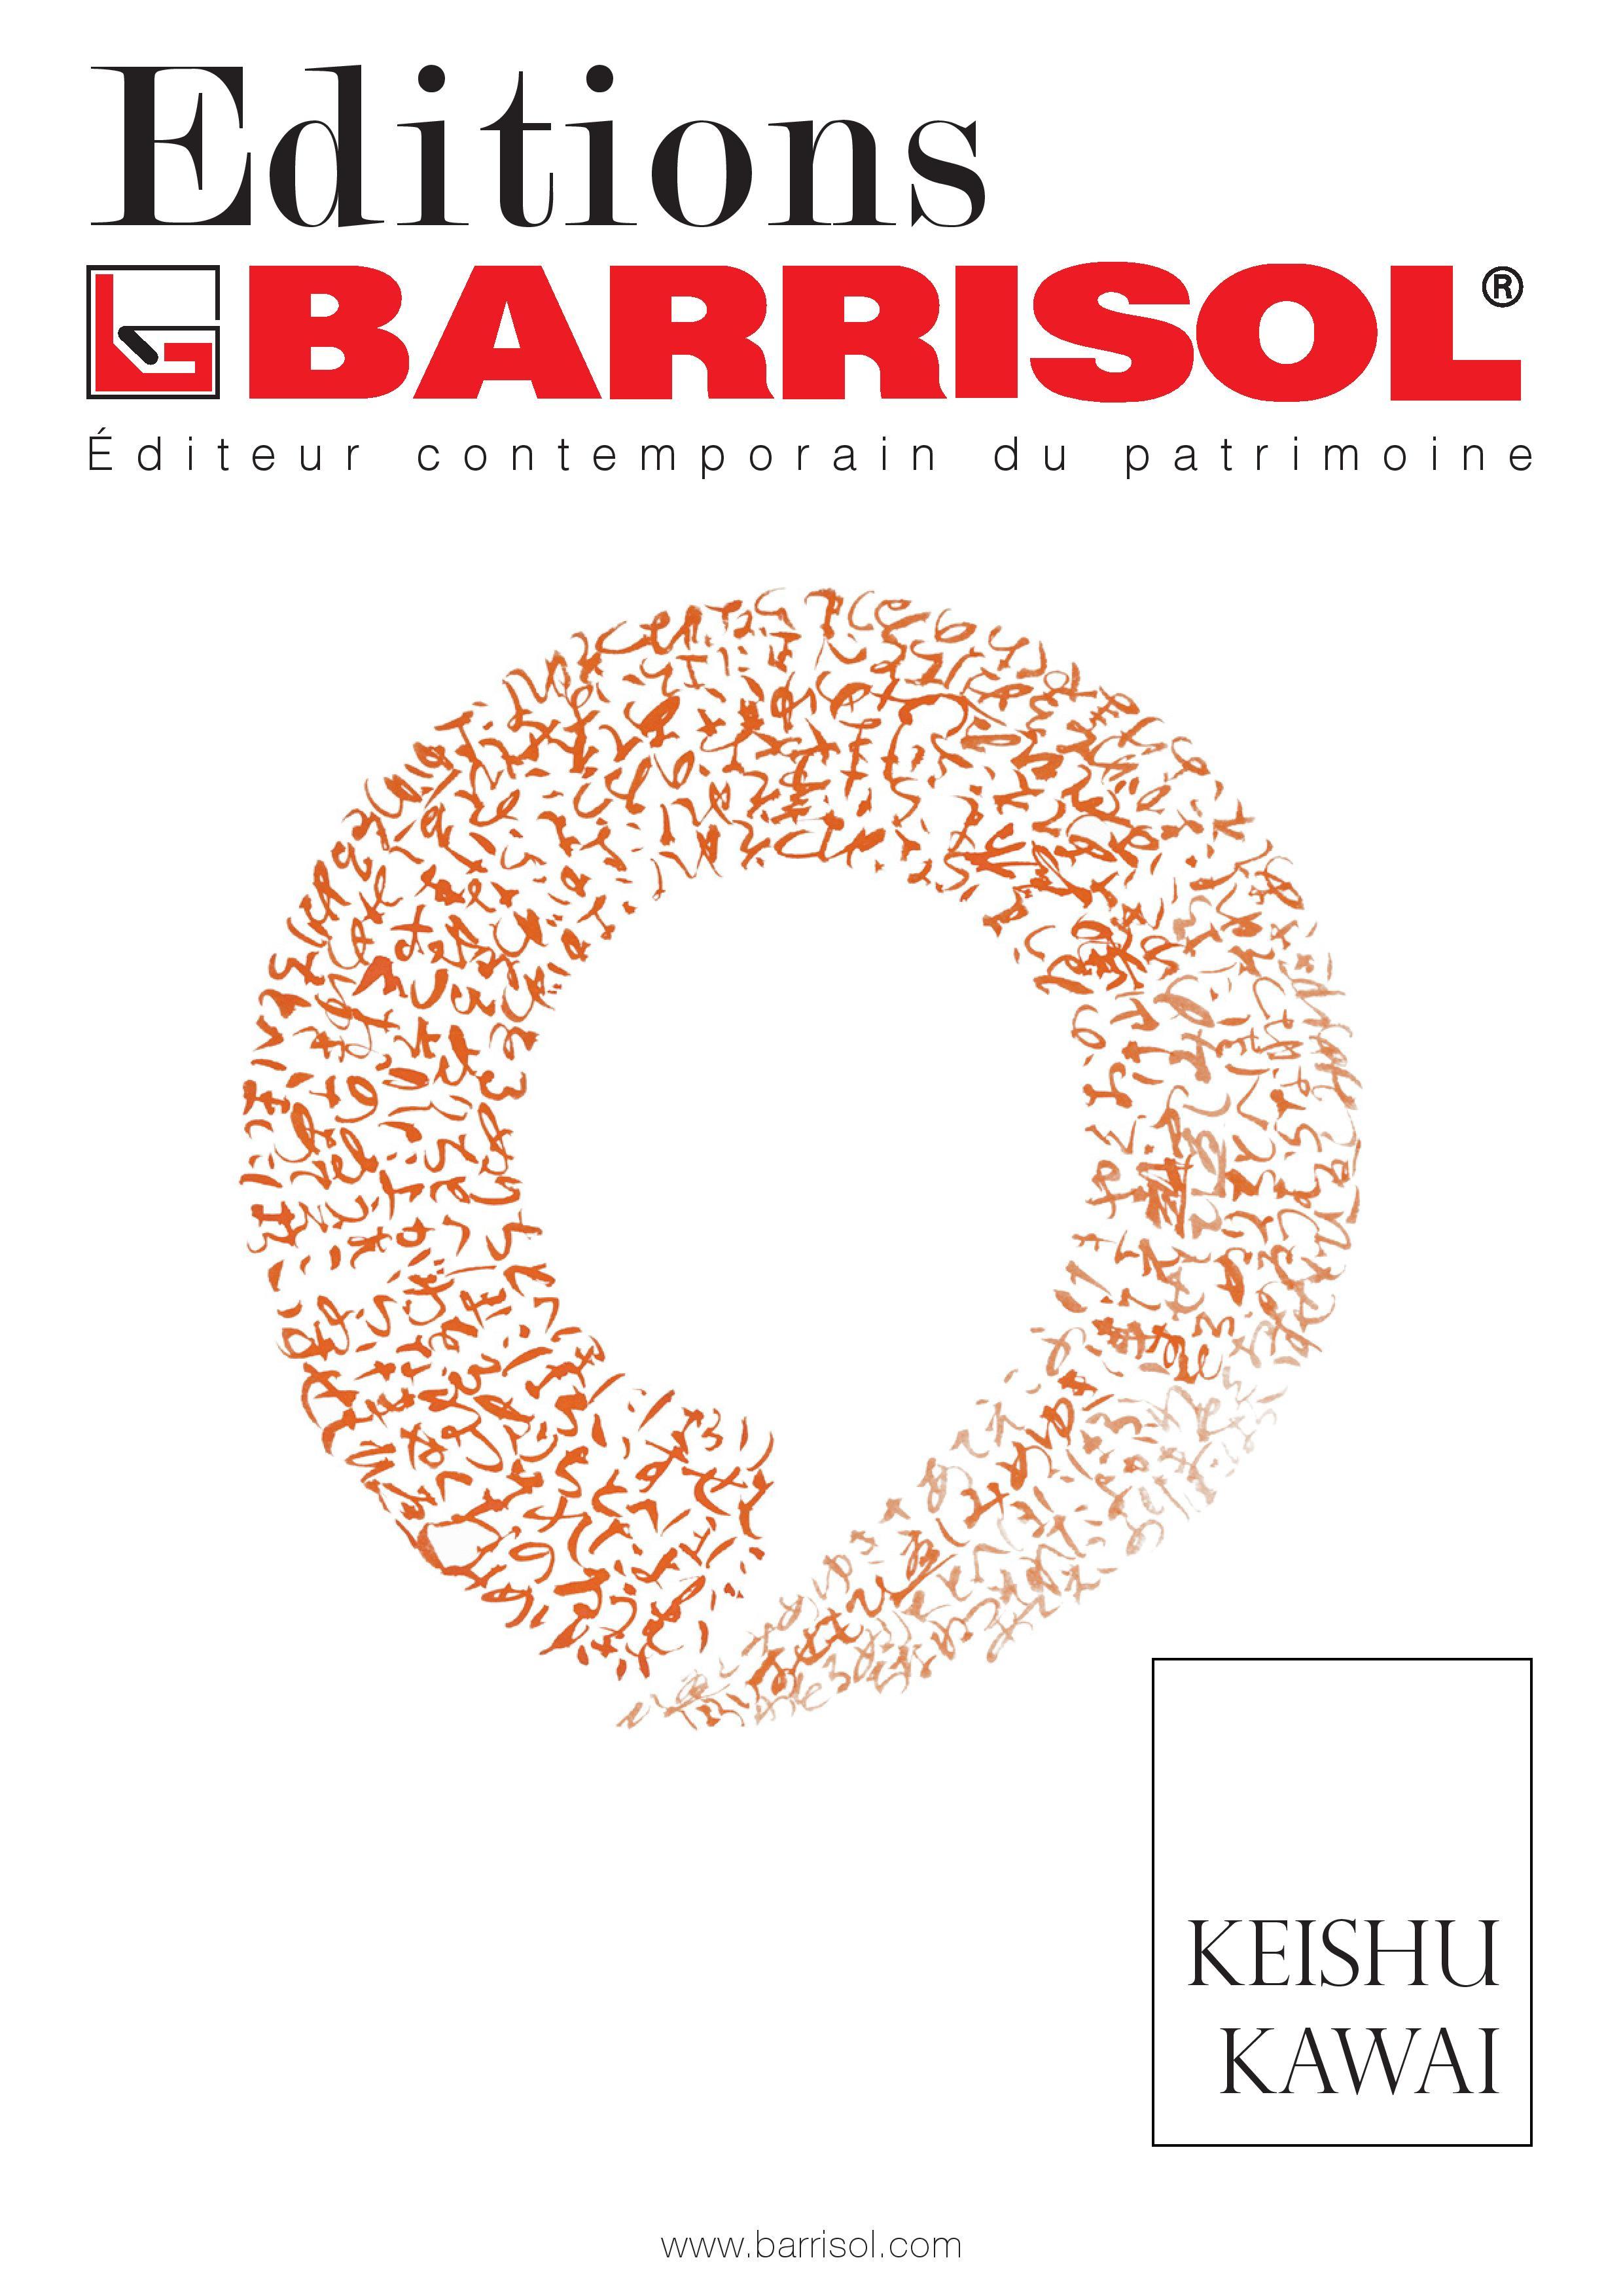 Editions BARRISOL - Leaflet Keishu Kawai